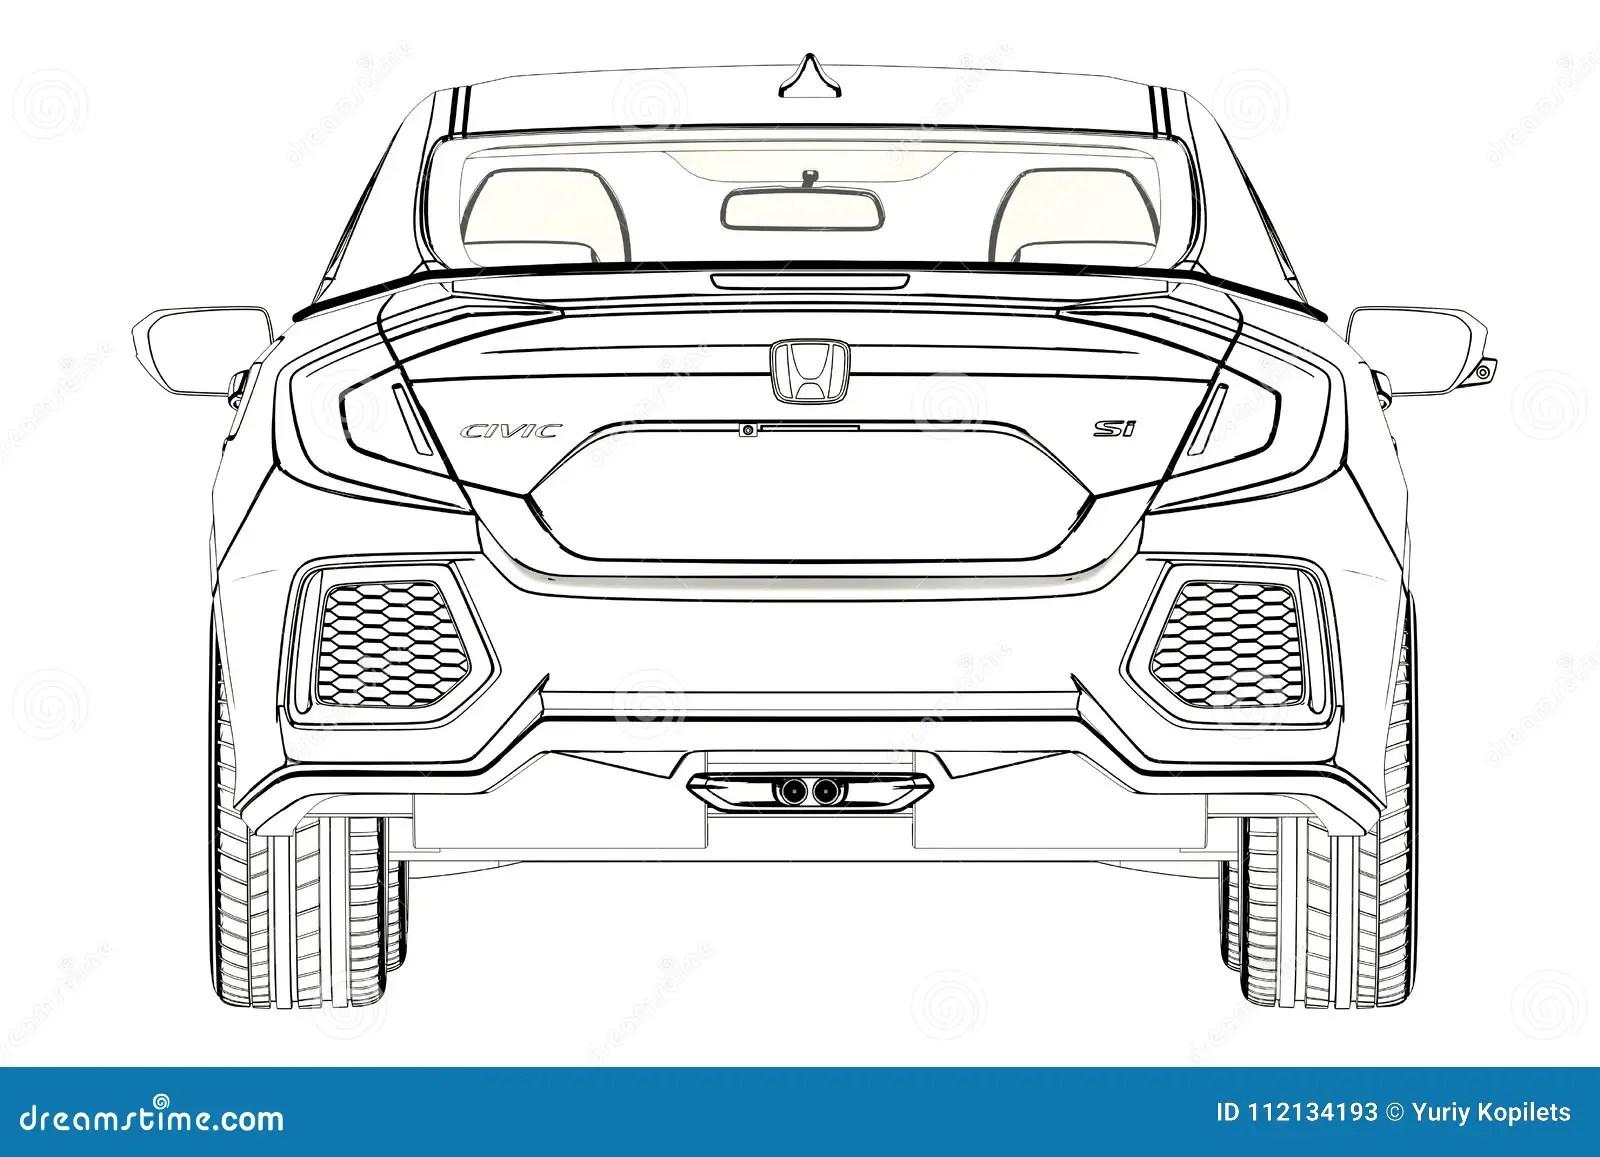 Grafik Limousine Honda Civics Skizze Abbildung 3d